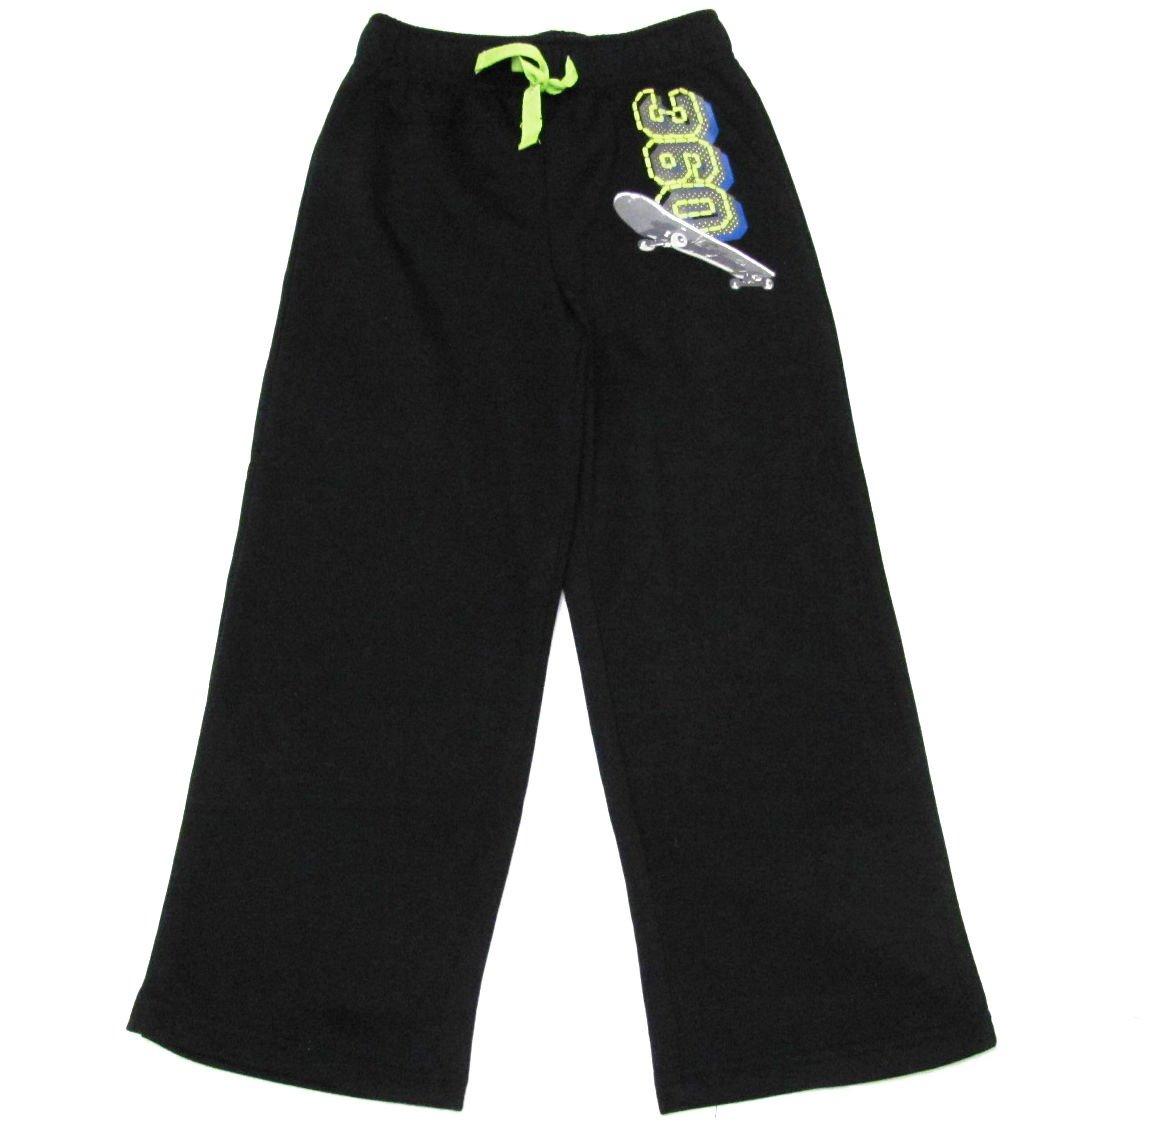 Jelli Fish Kids Boys XS 4-5 Black Skater Fleece Pants Lounge Pajama Sweatpants